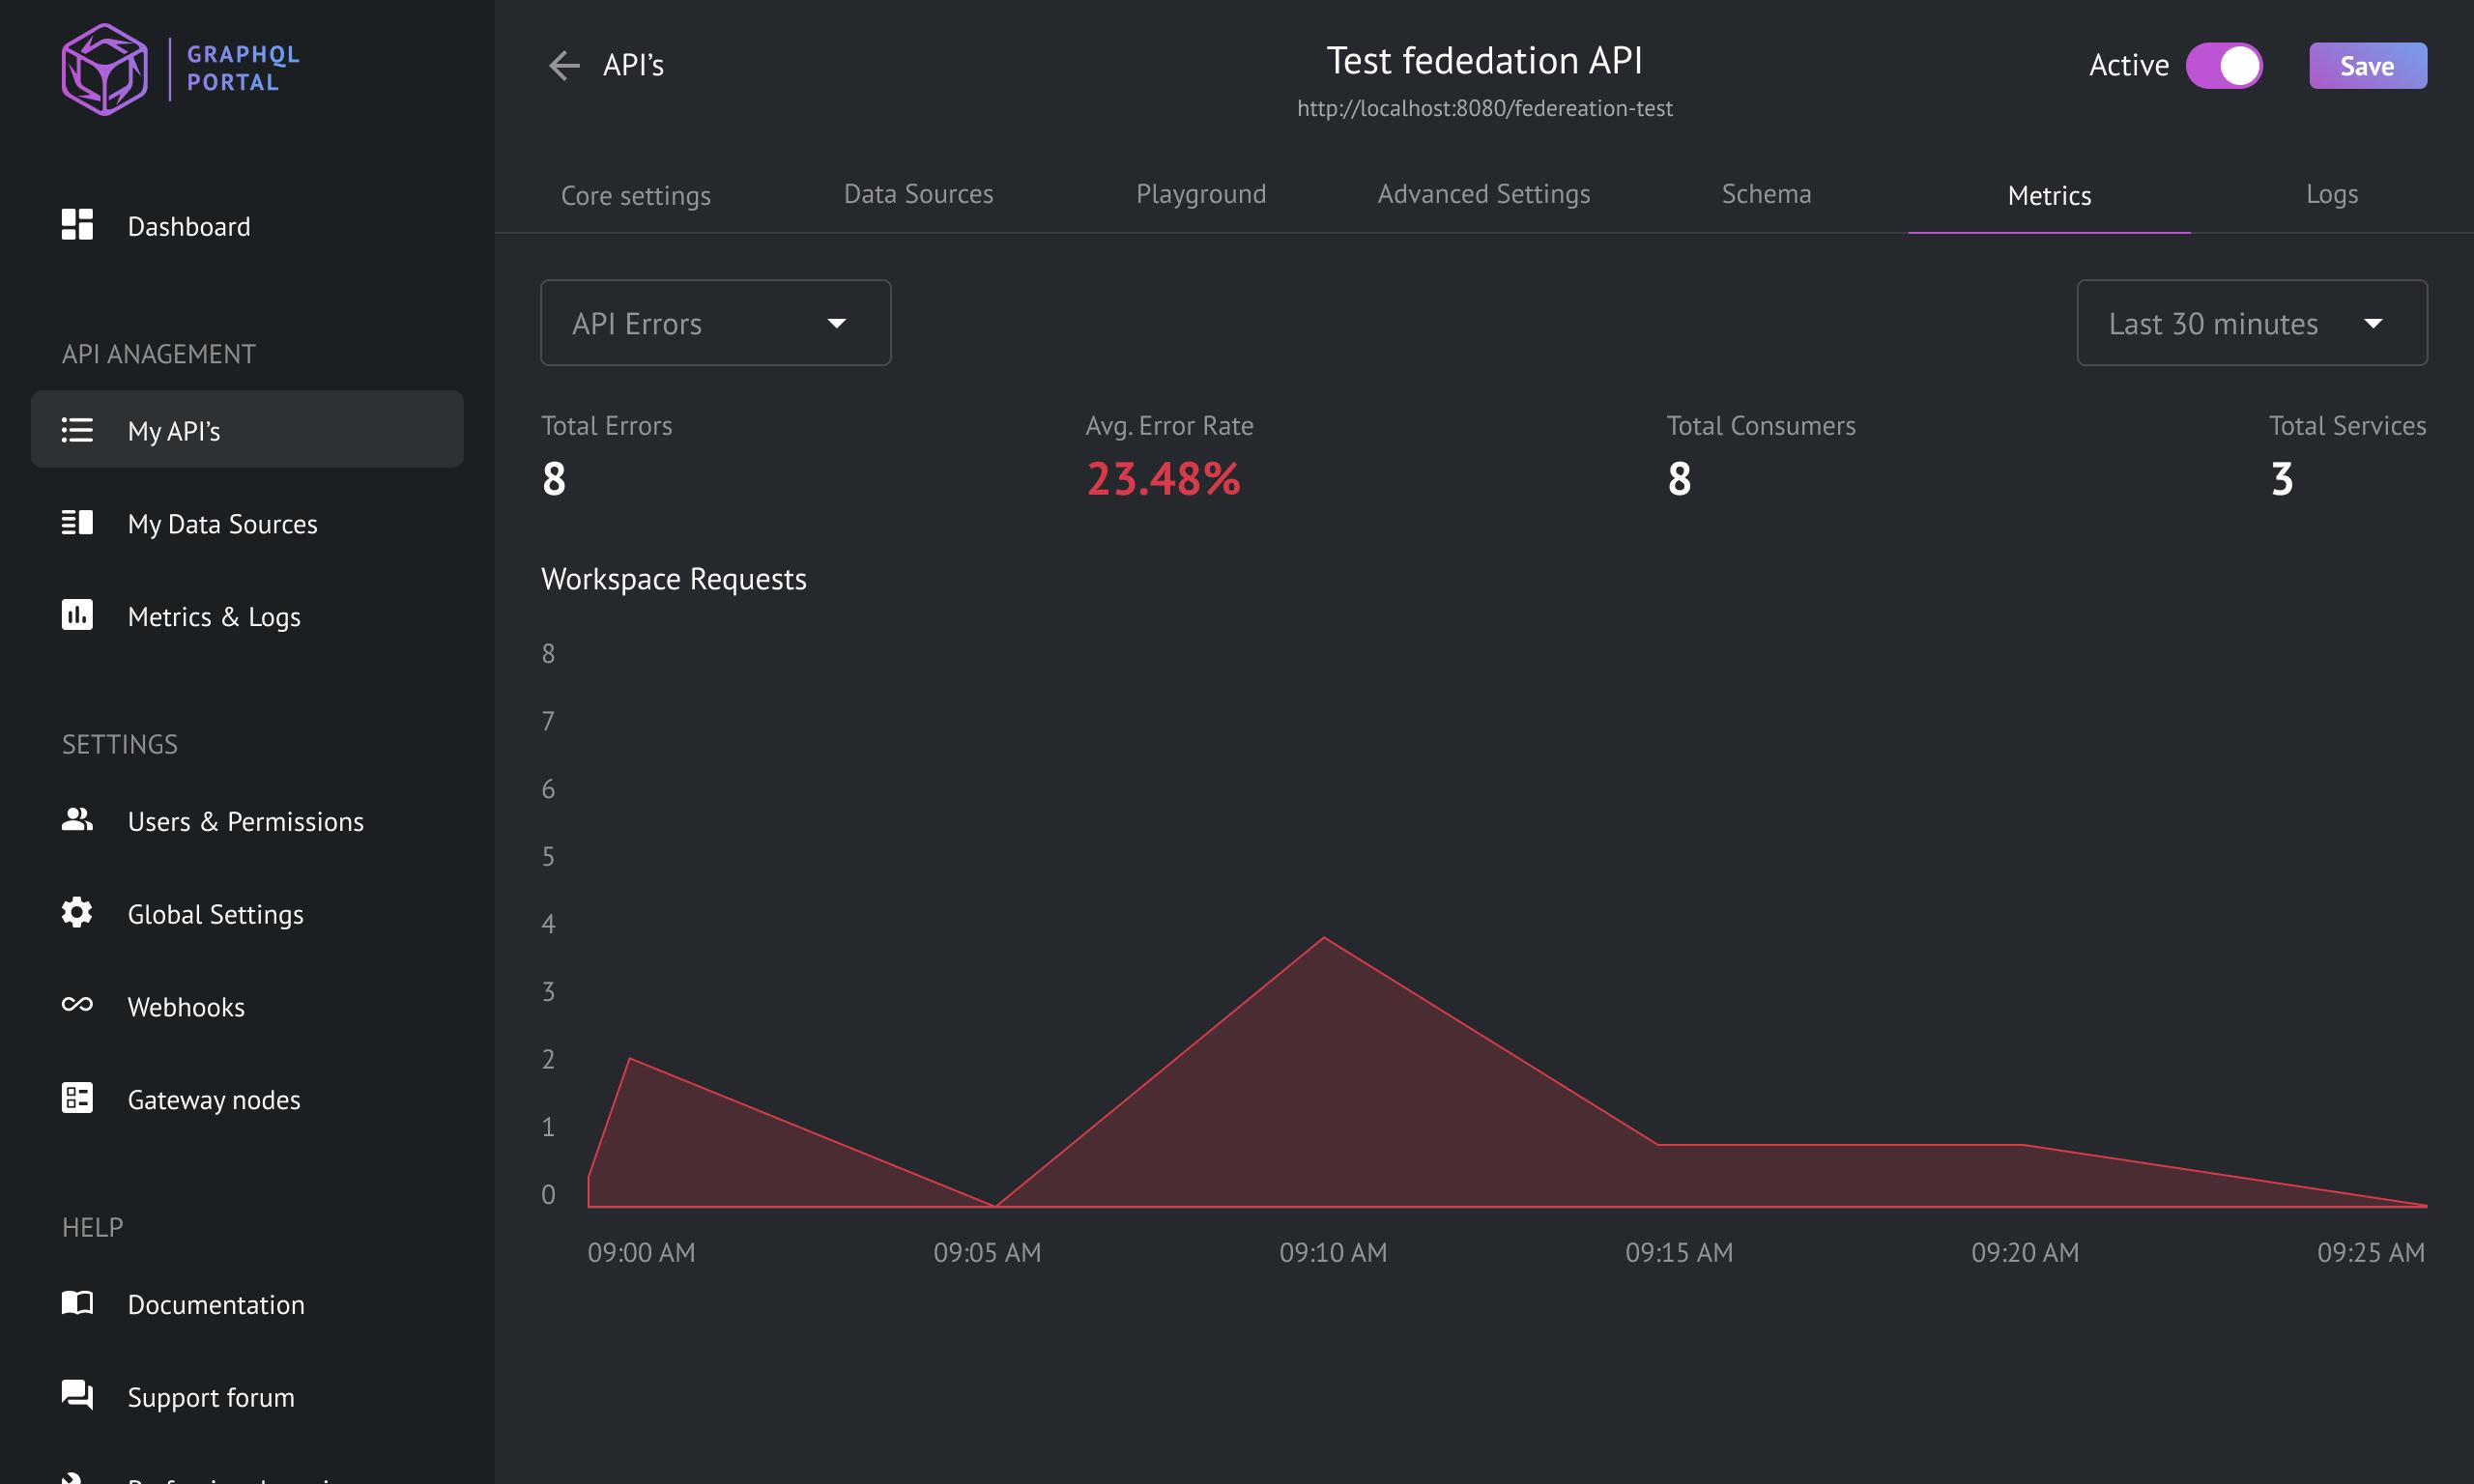 GraphQL analytics and metrics open source